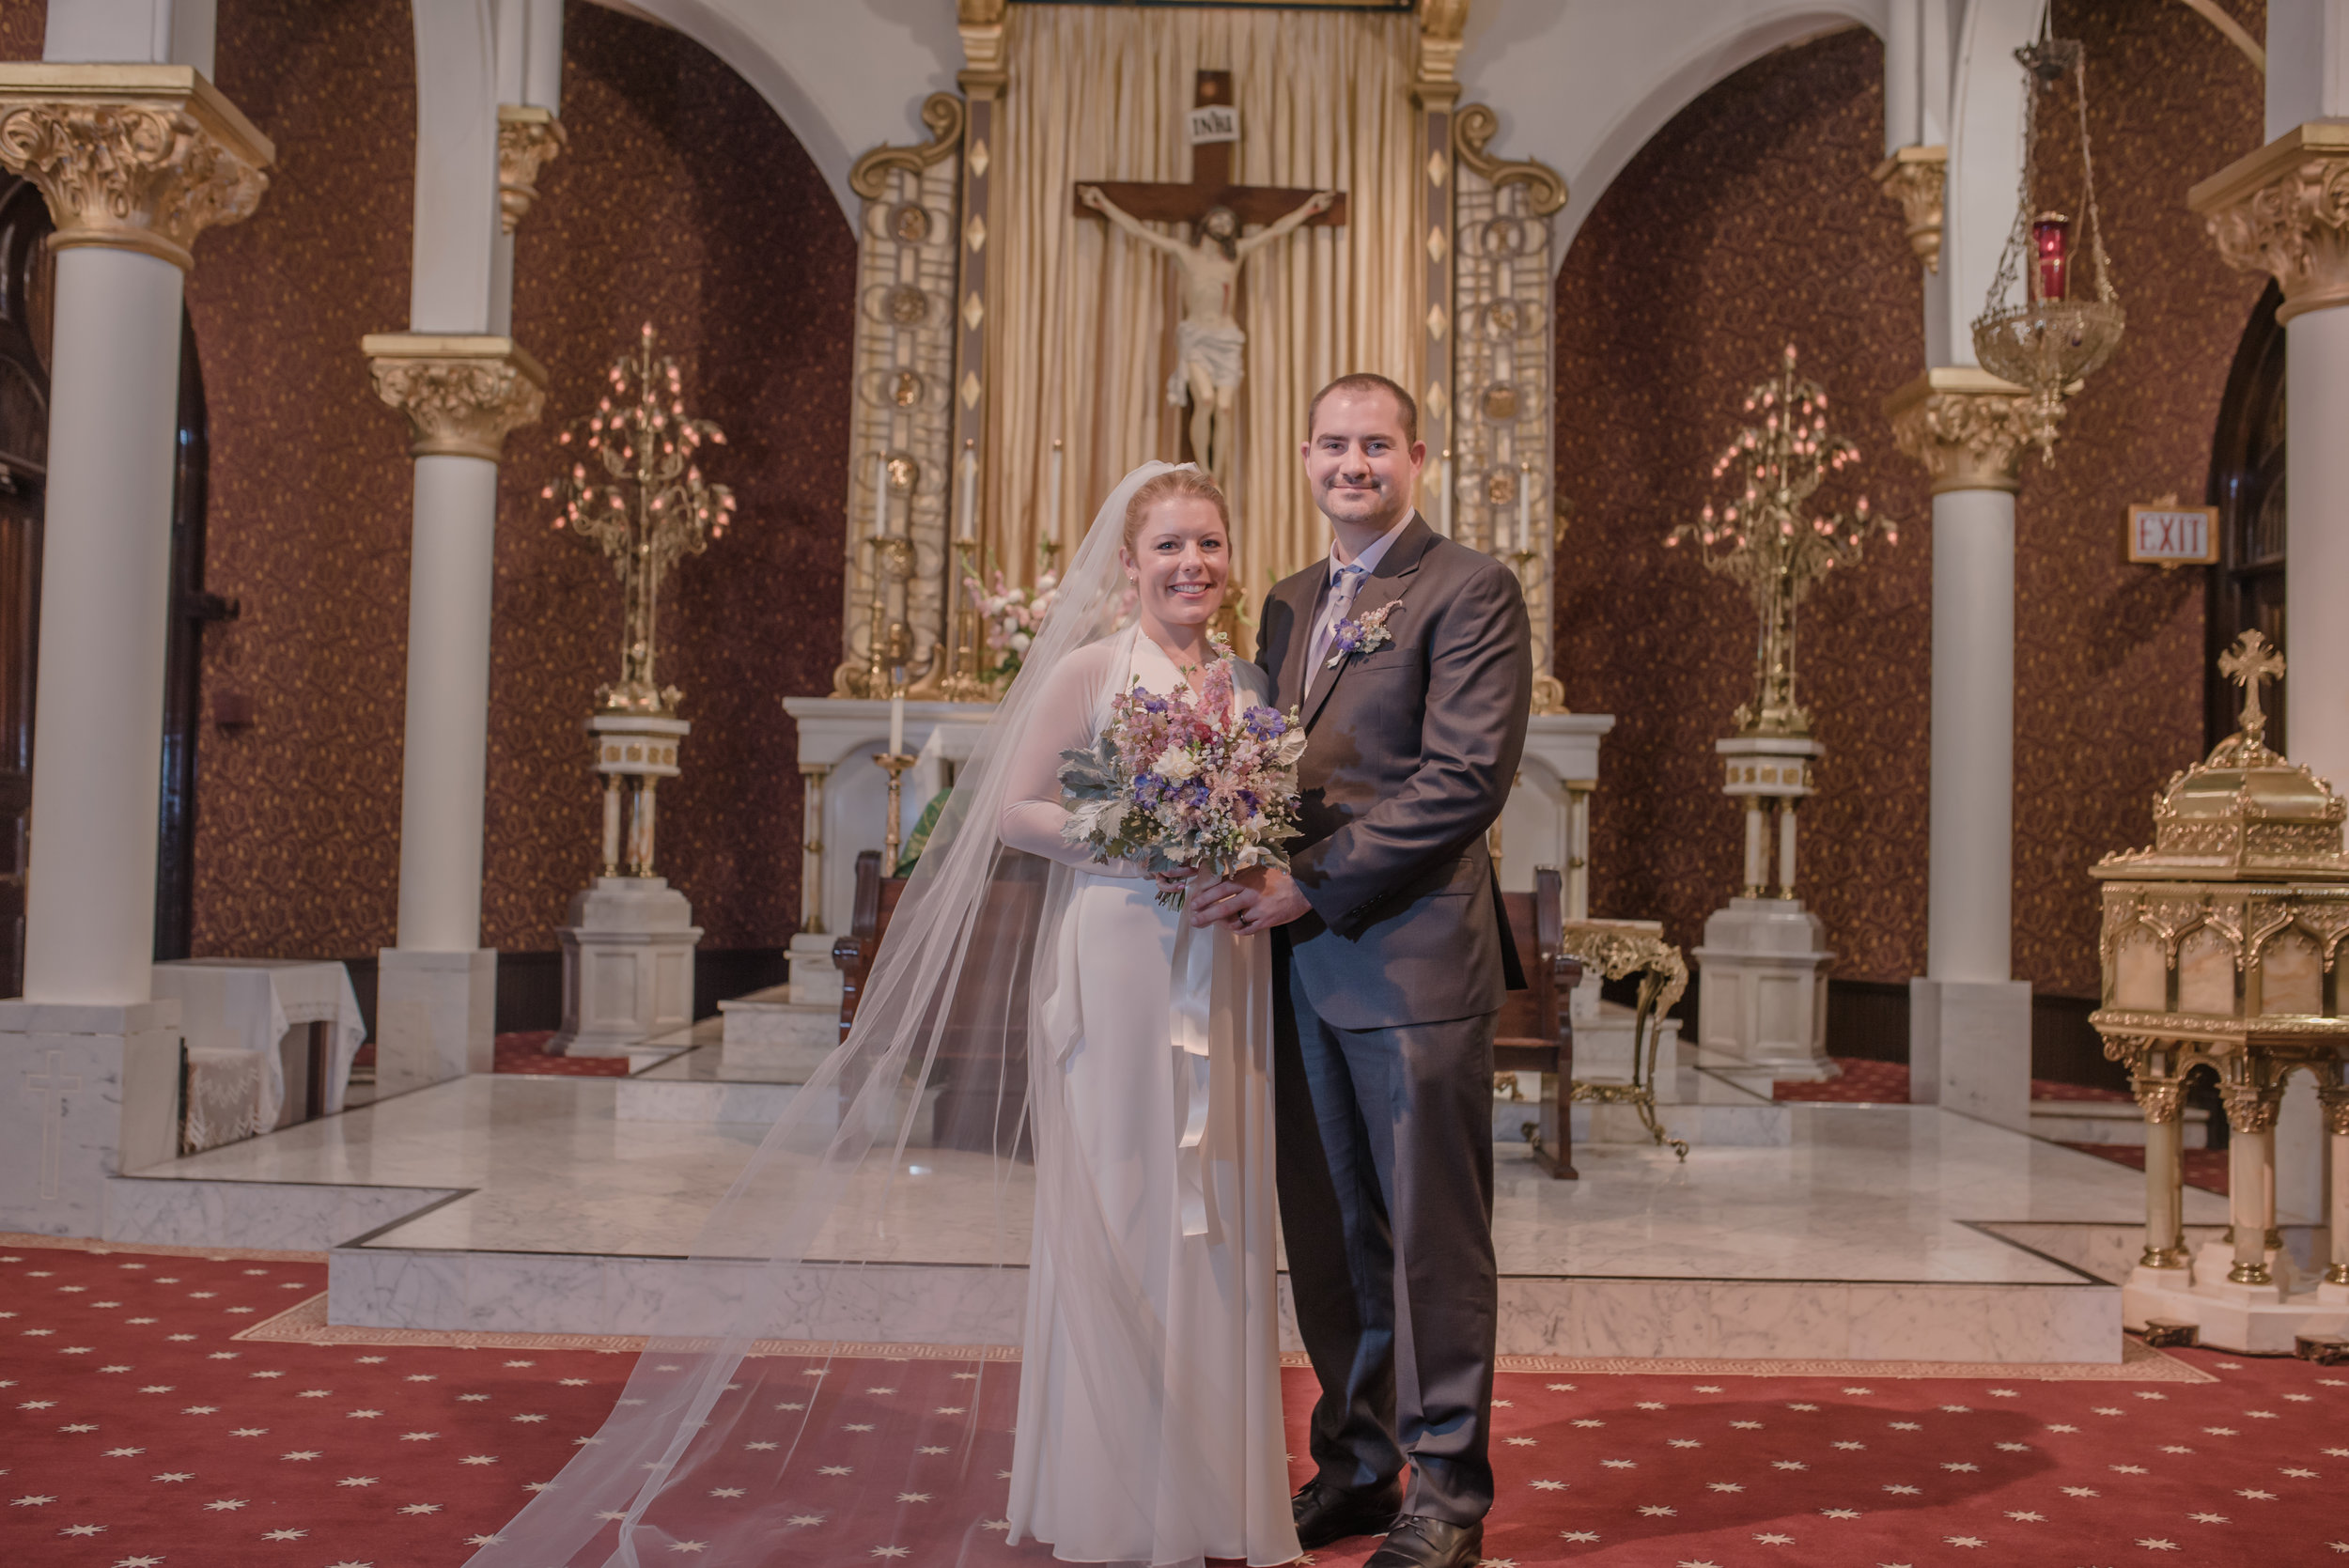 Matt+Becky Wedding - Bride Groom Photo.jpg